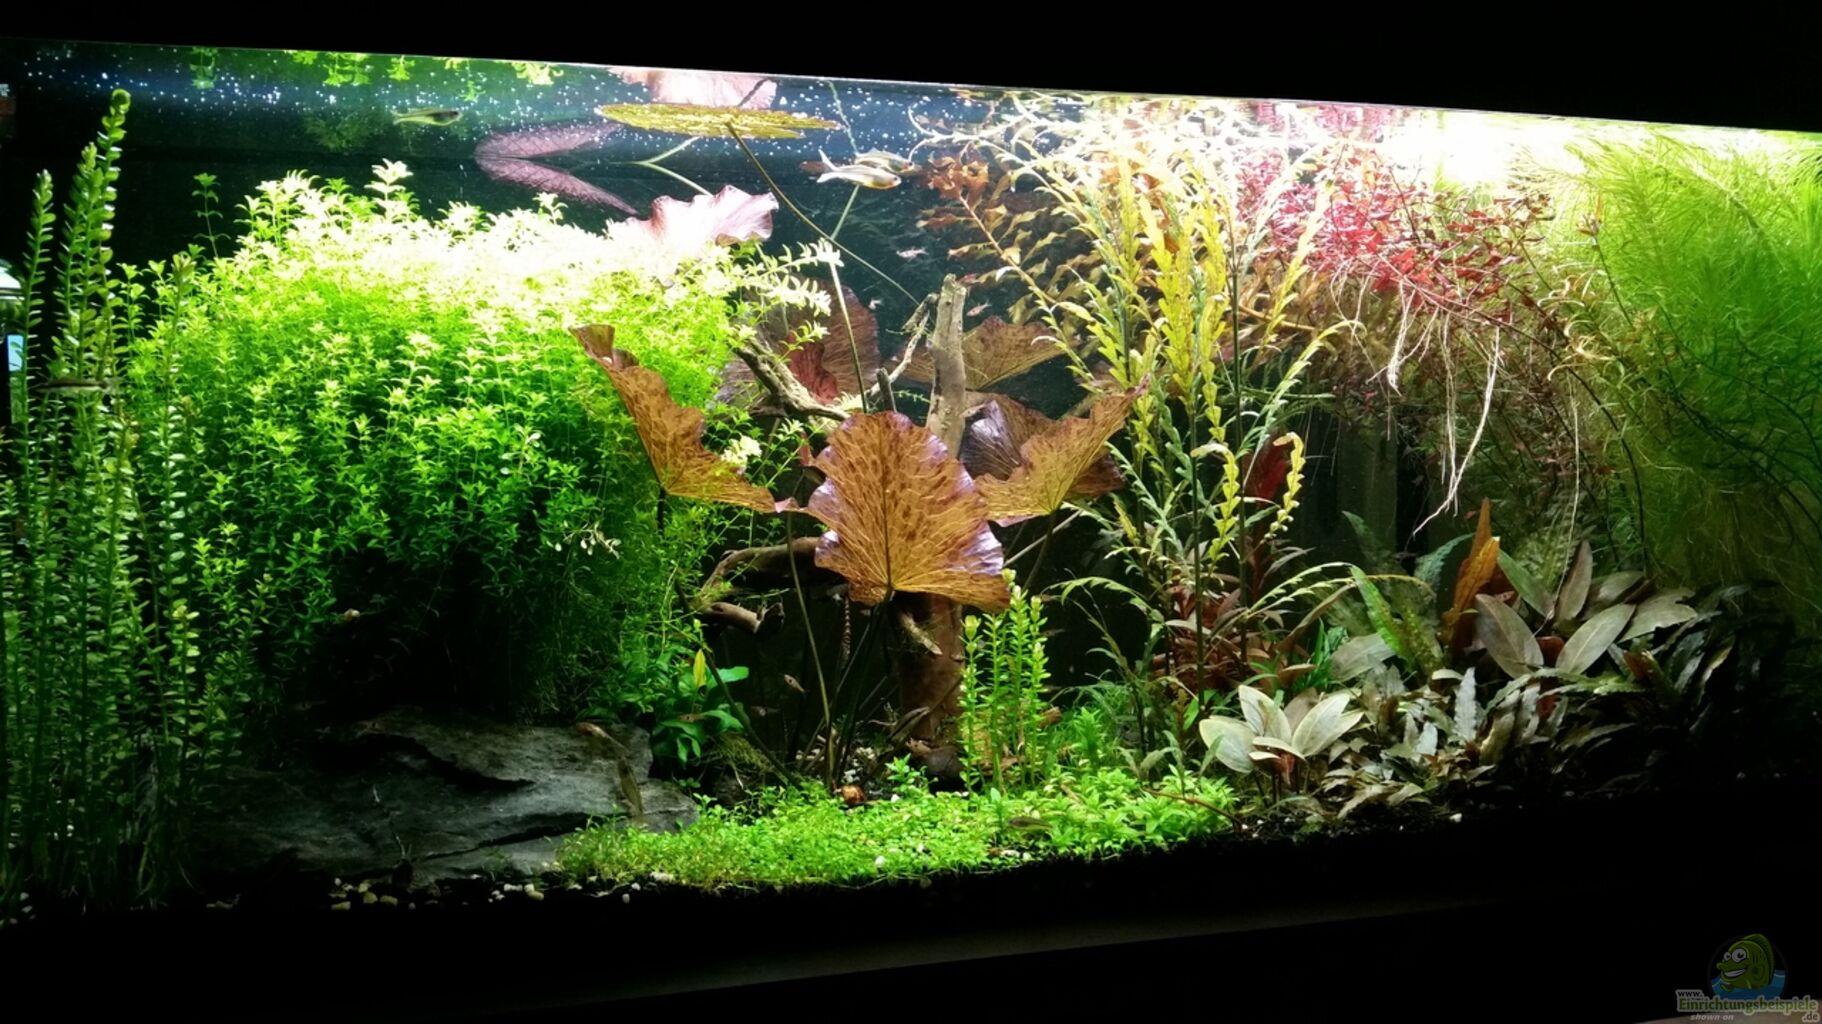 Aquarium von ichigo becken 32663 for Aquarium becken